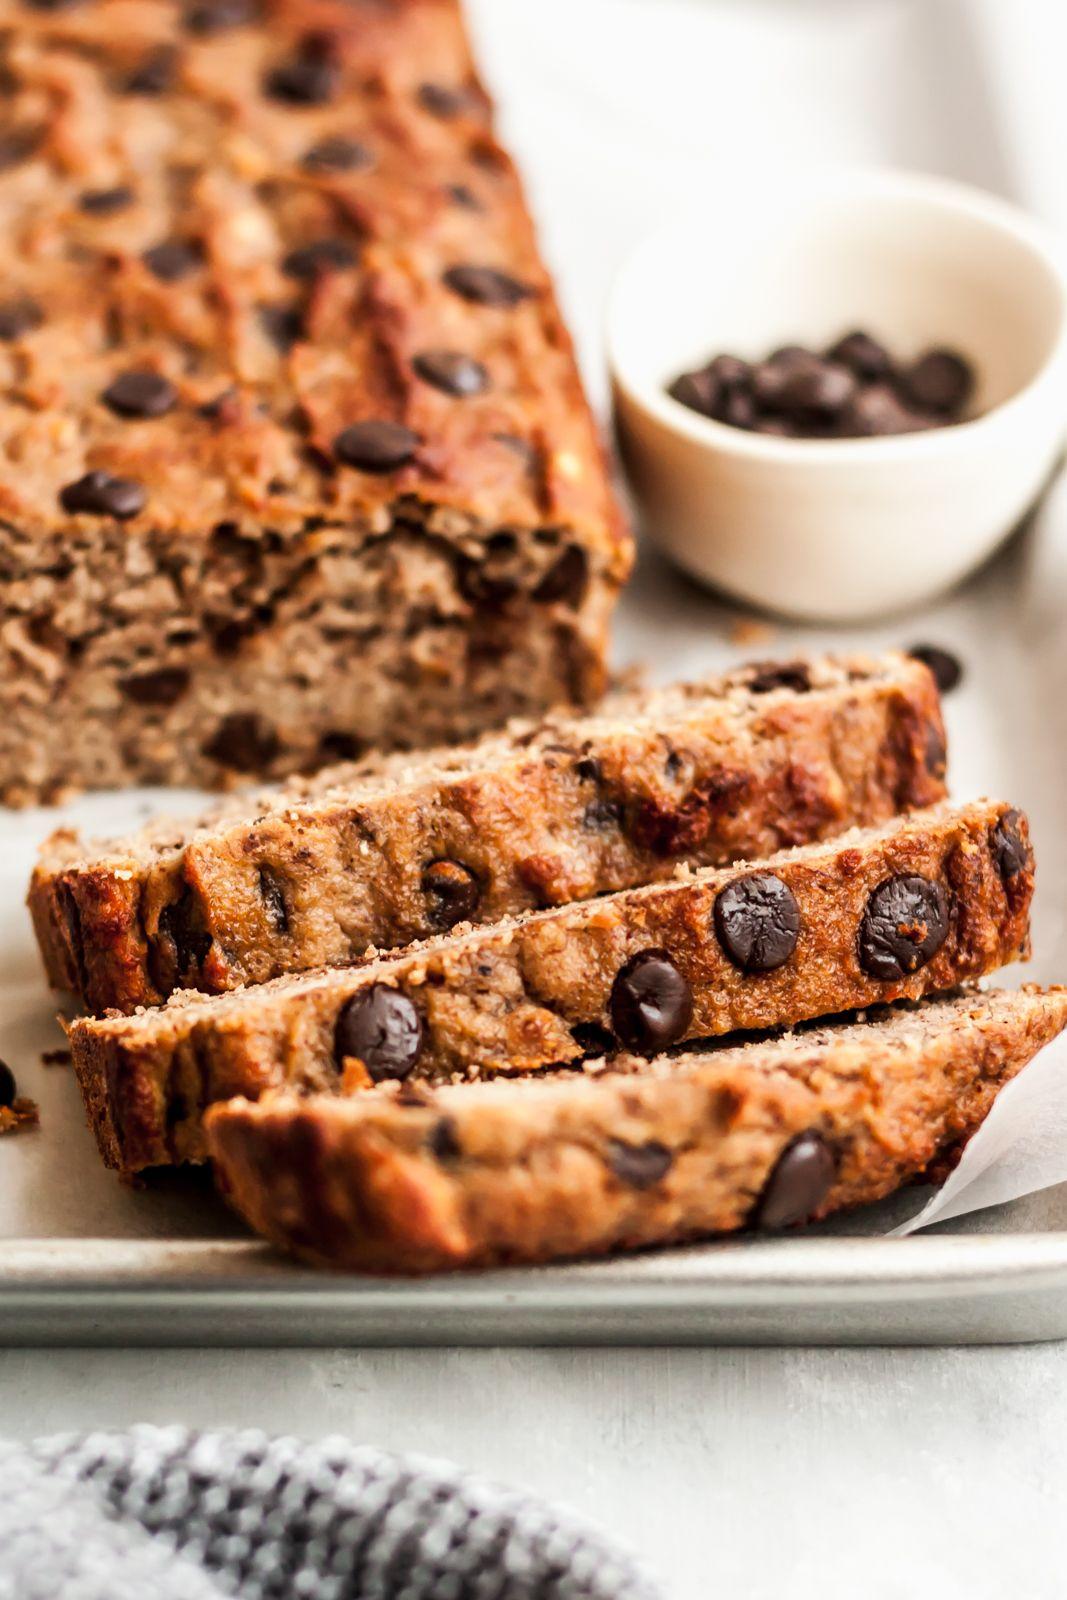 Paleo Chocolate Chip Coconut Flour Banana Bread